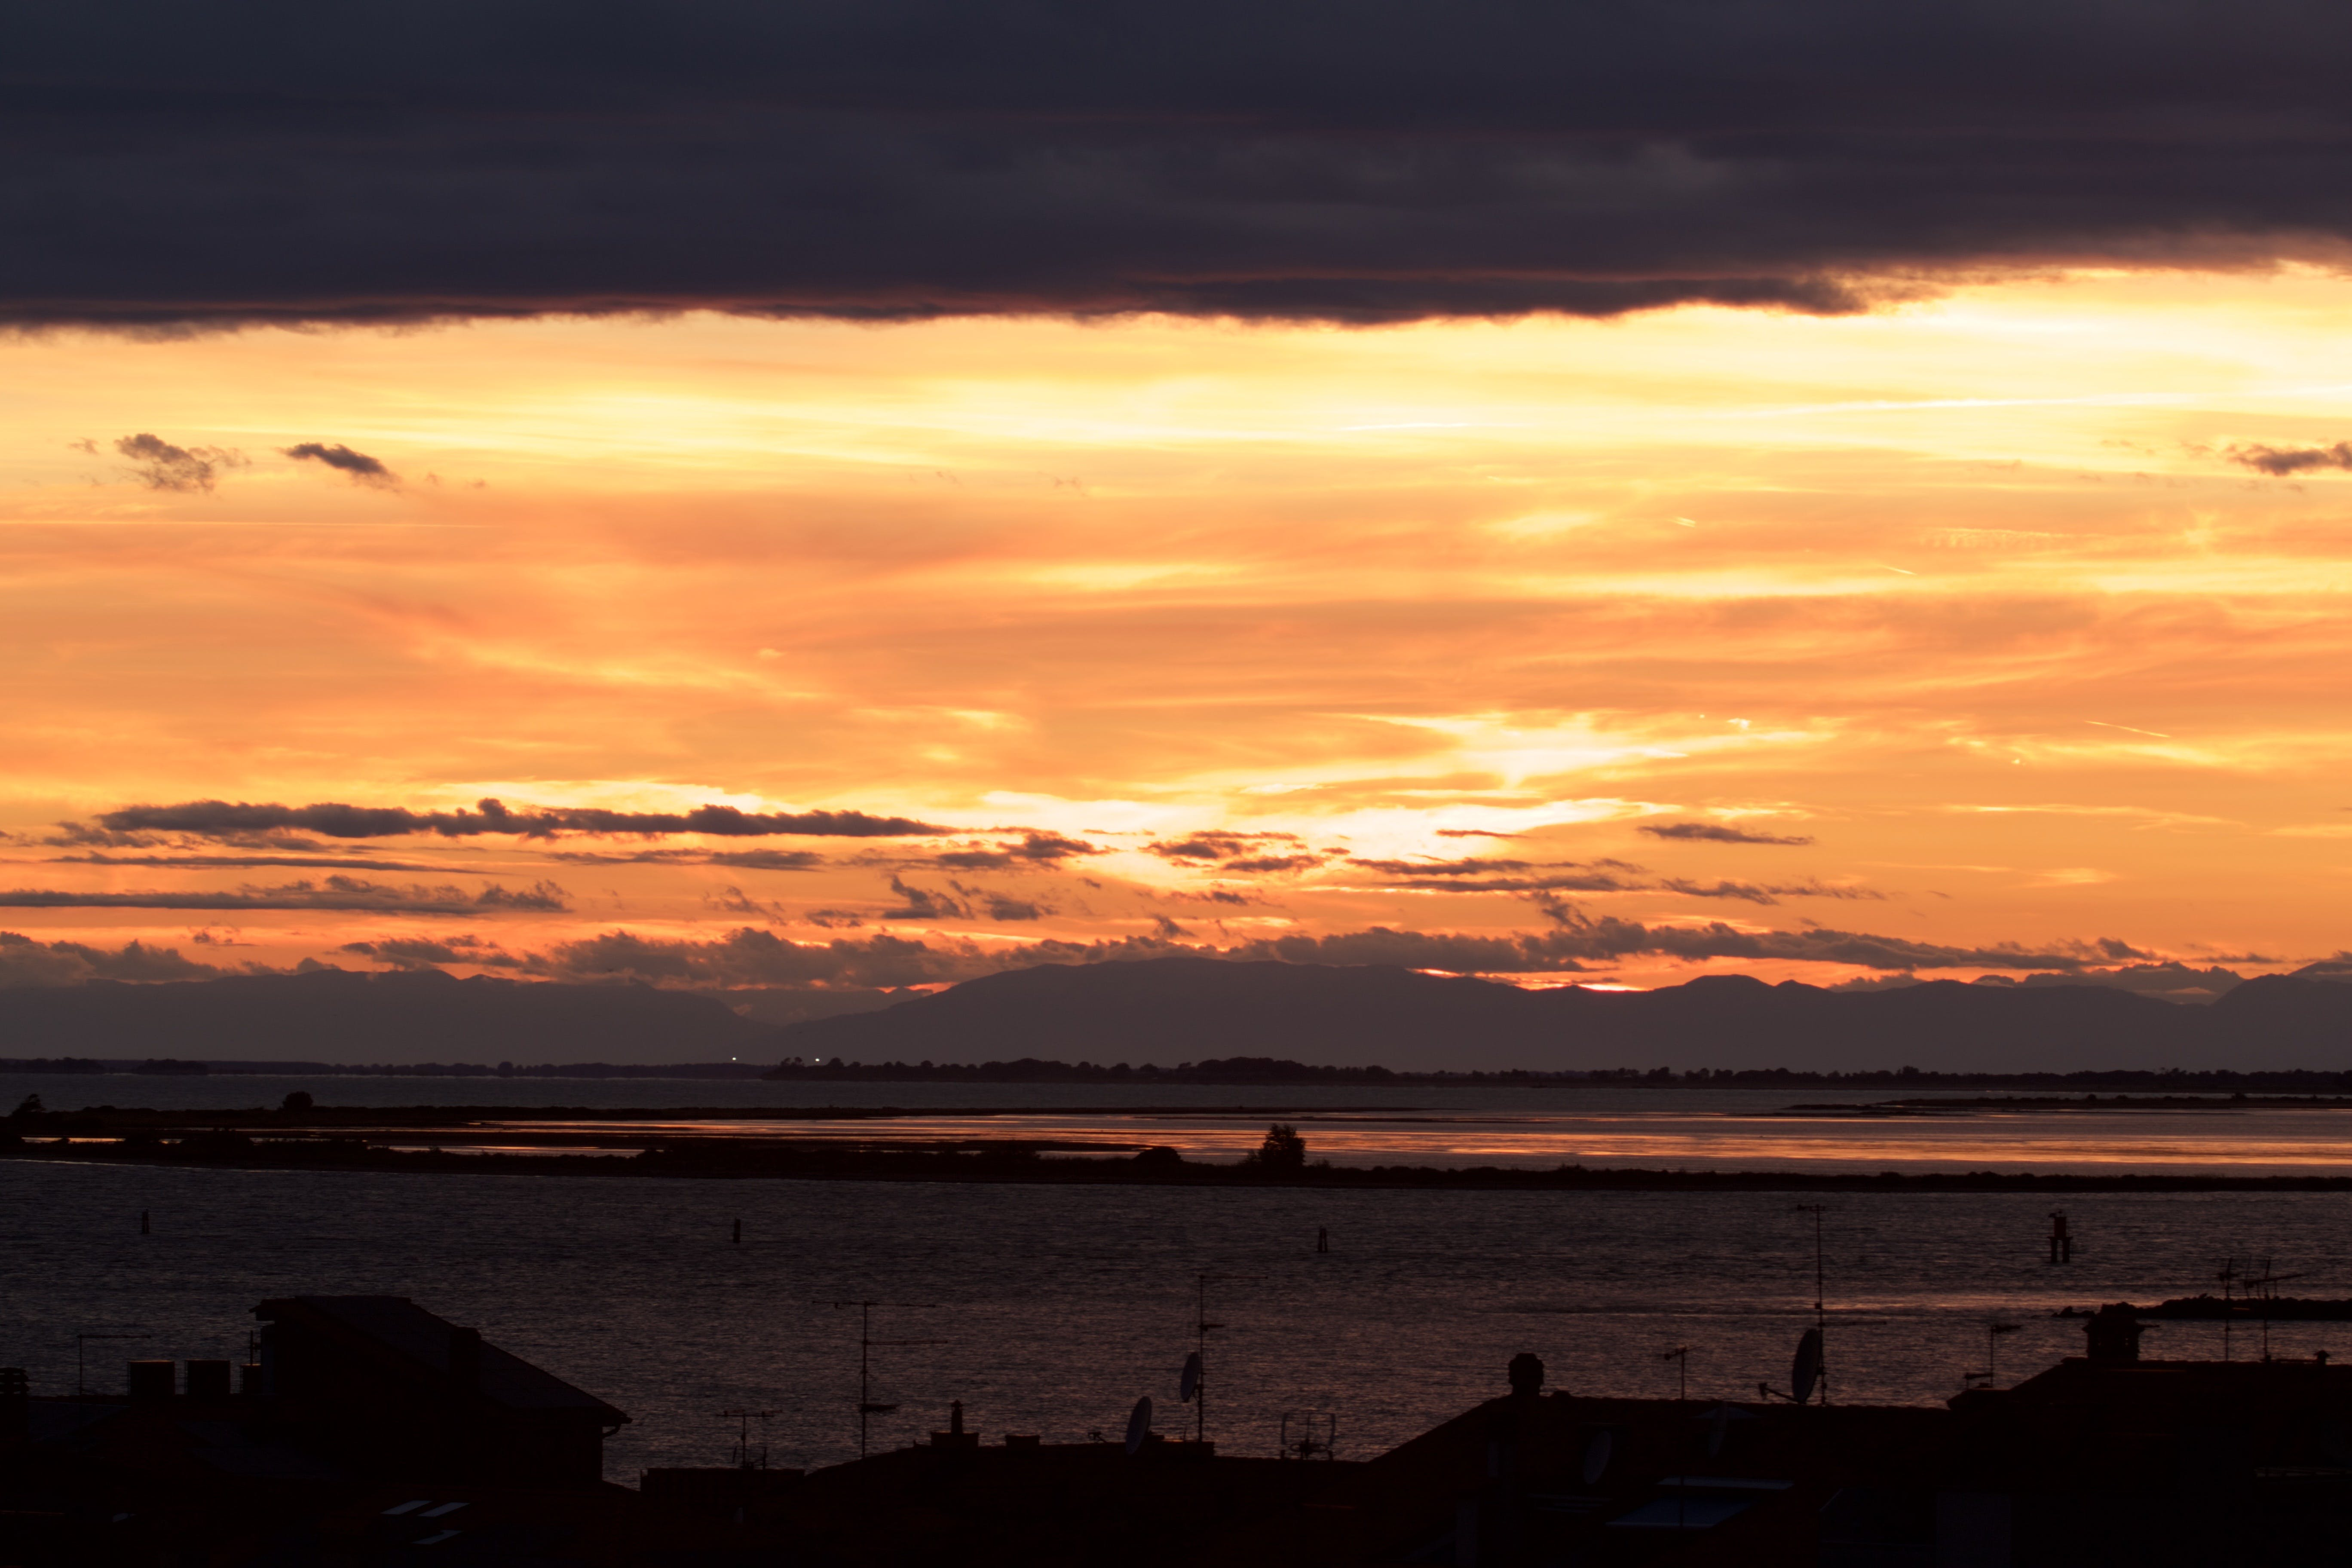 adriatic sea, clouds, golden sun